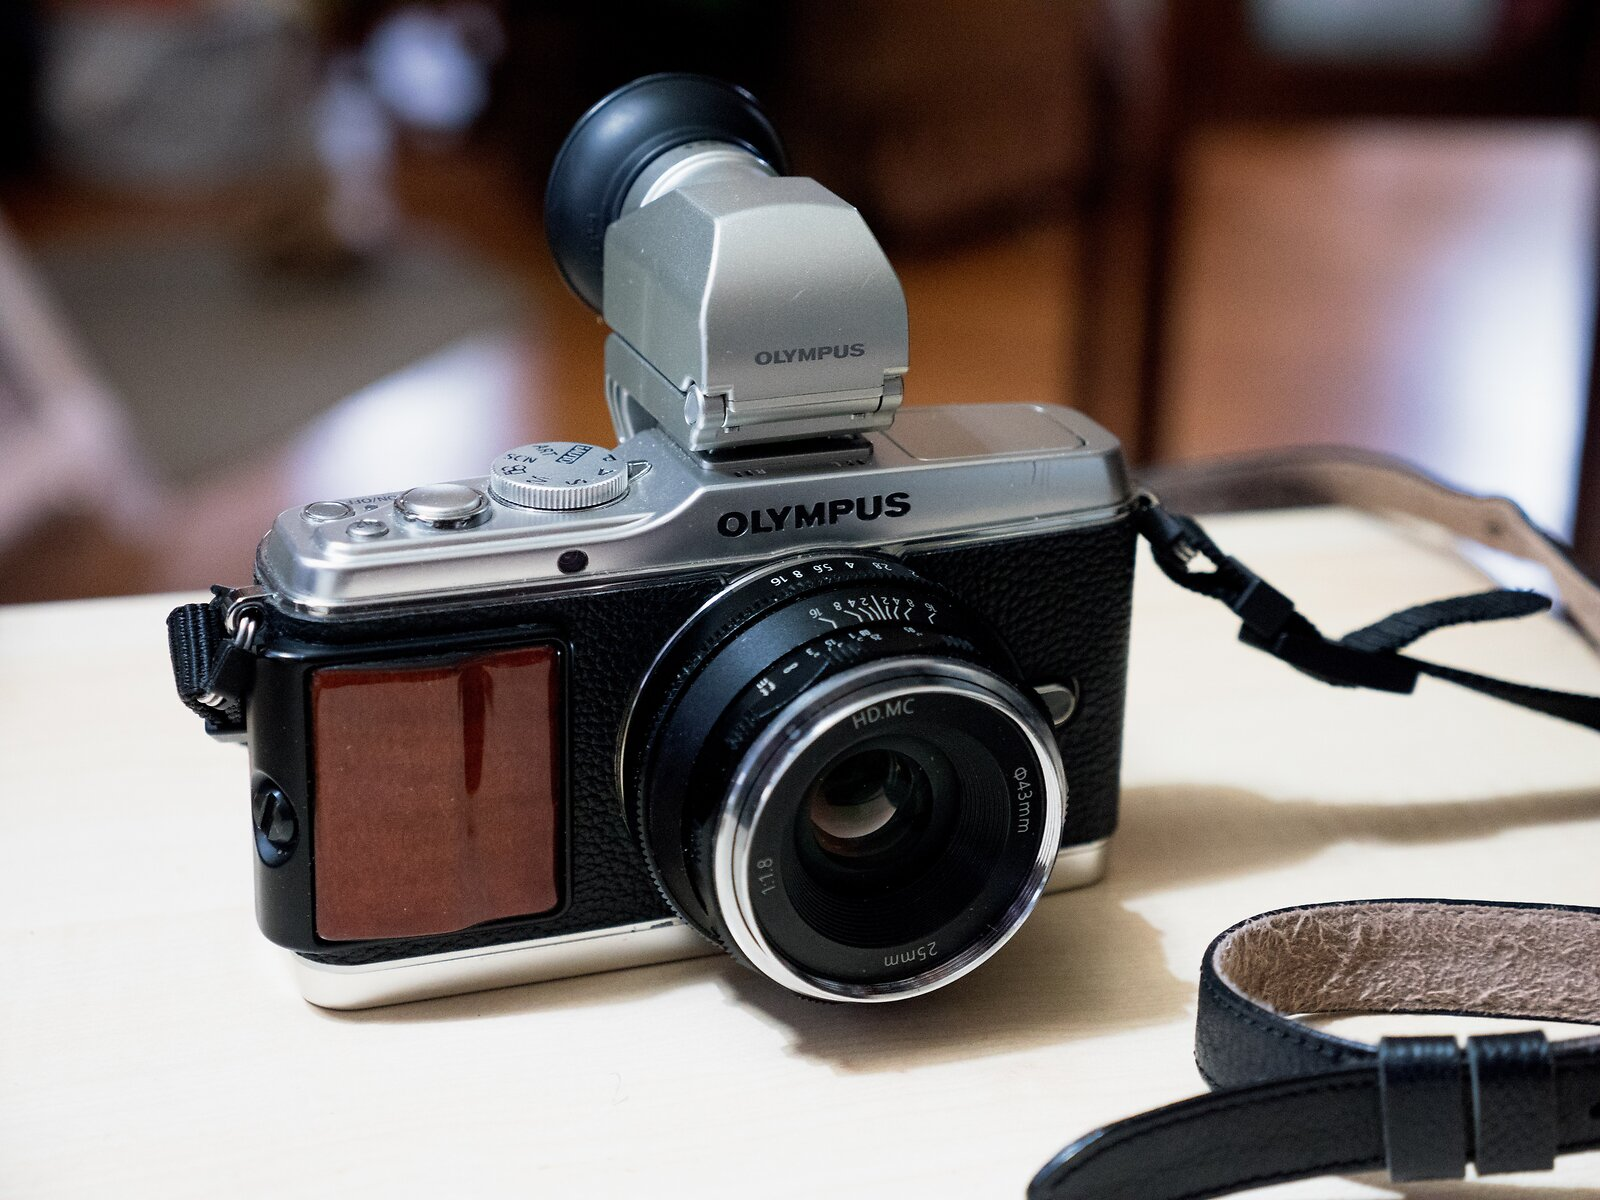 GX8_Oct24_EP3+Pergear_lens.jpg